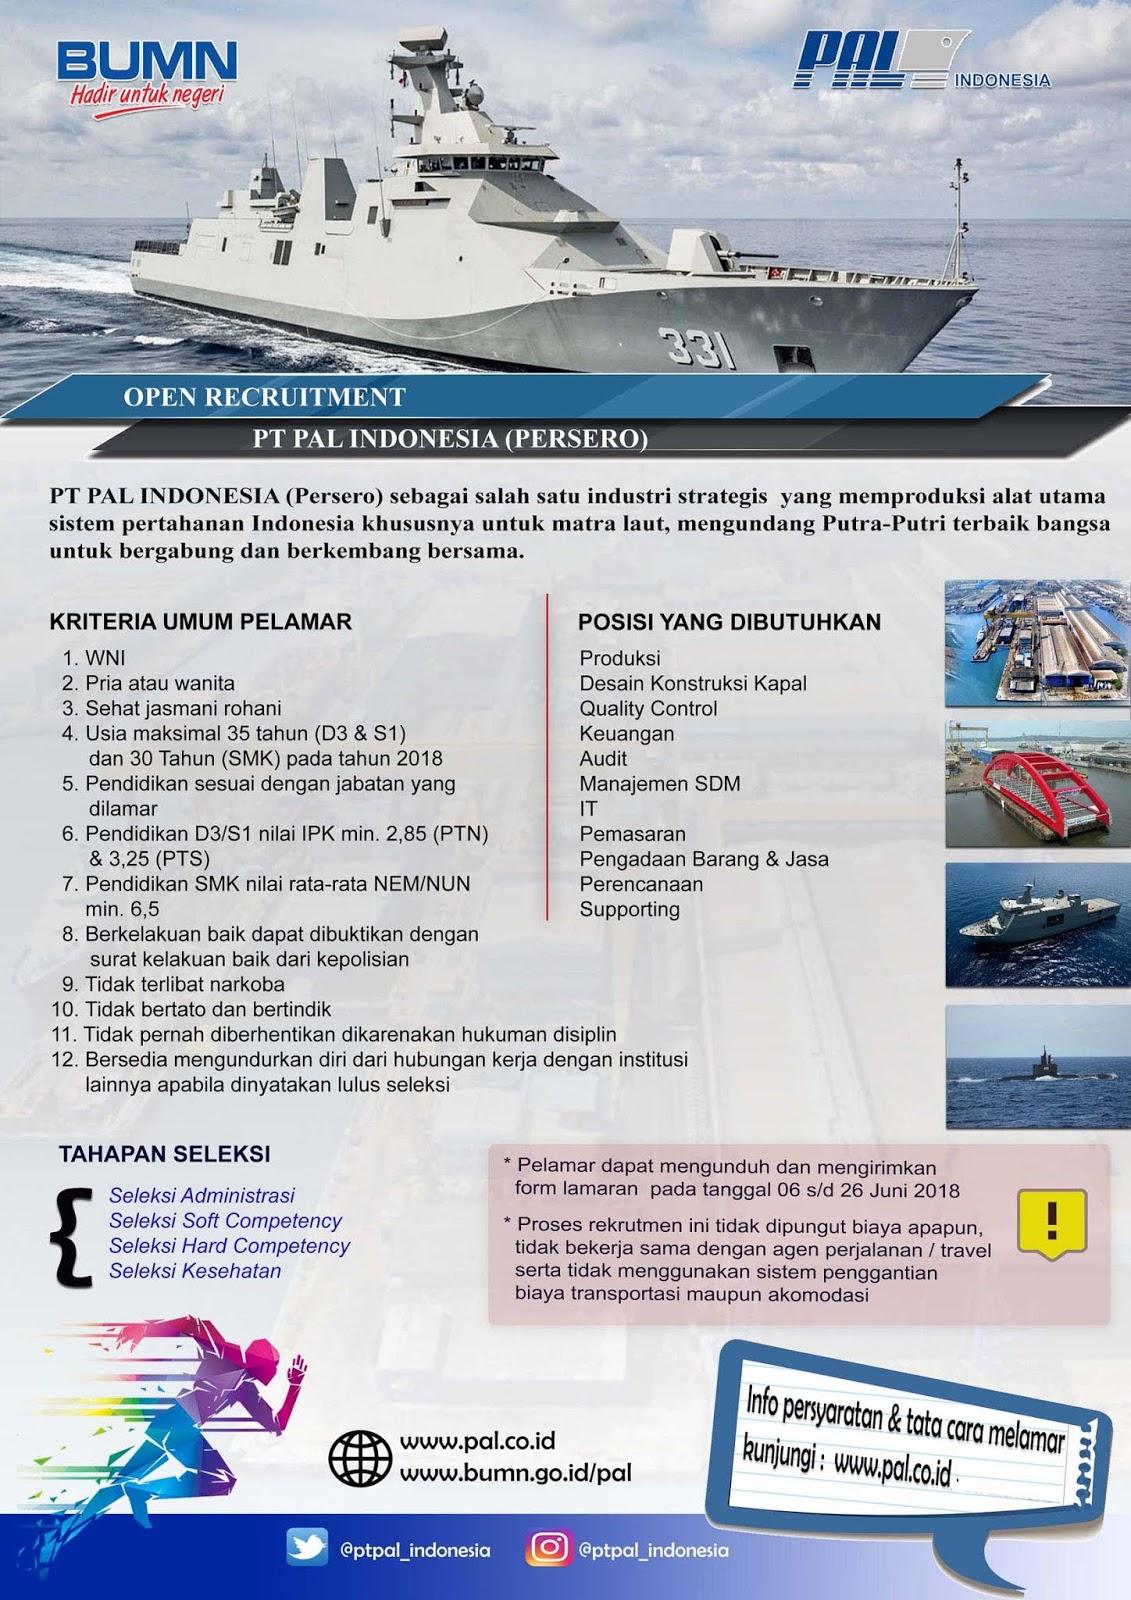 Lowongan Kerja PT. PAL Indonesia (Persero) 2018 pal2